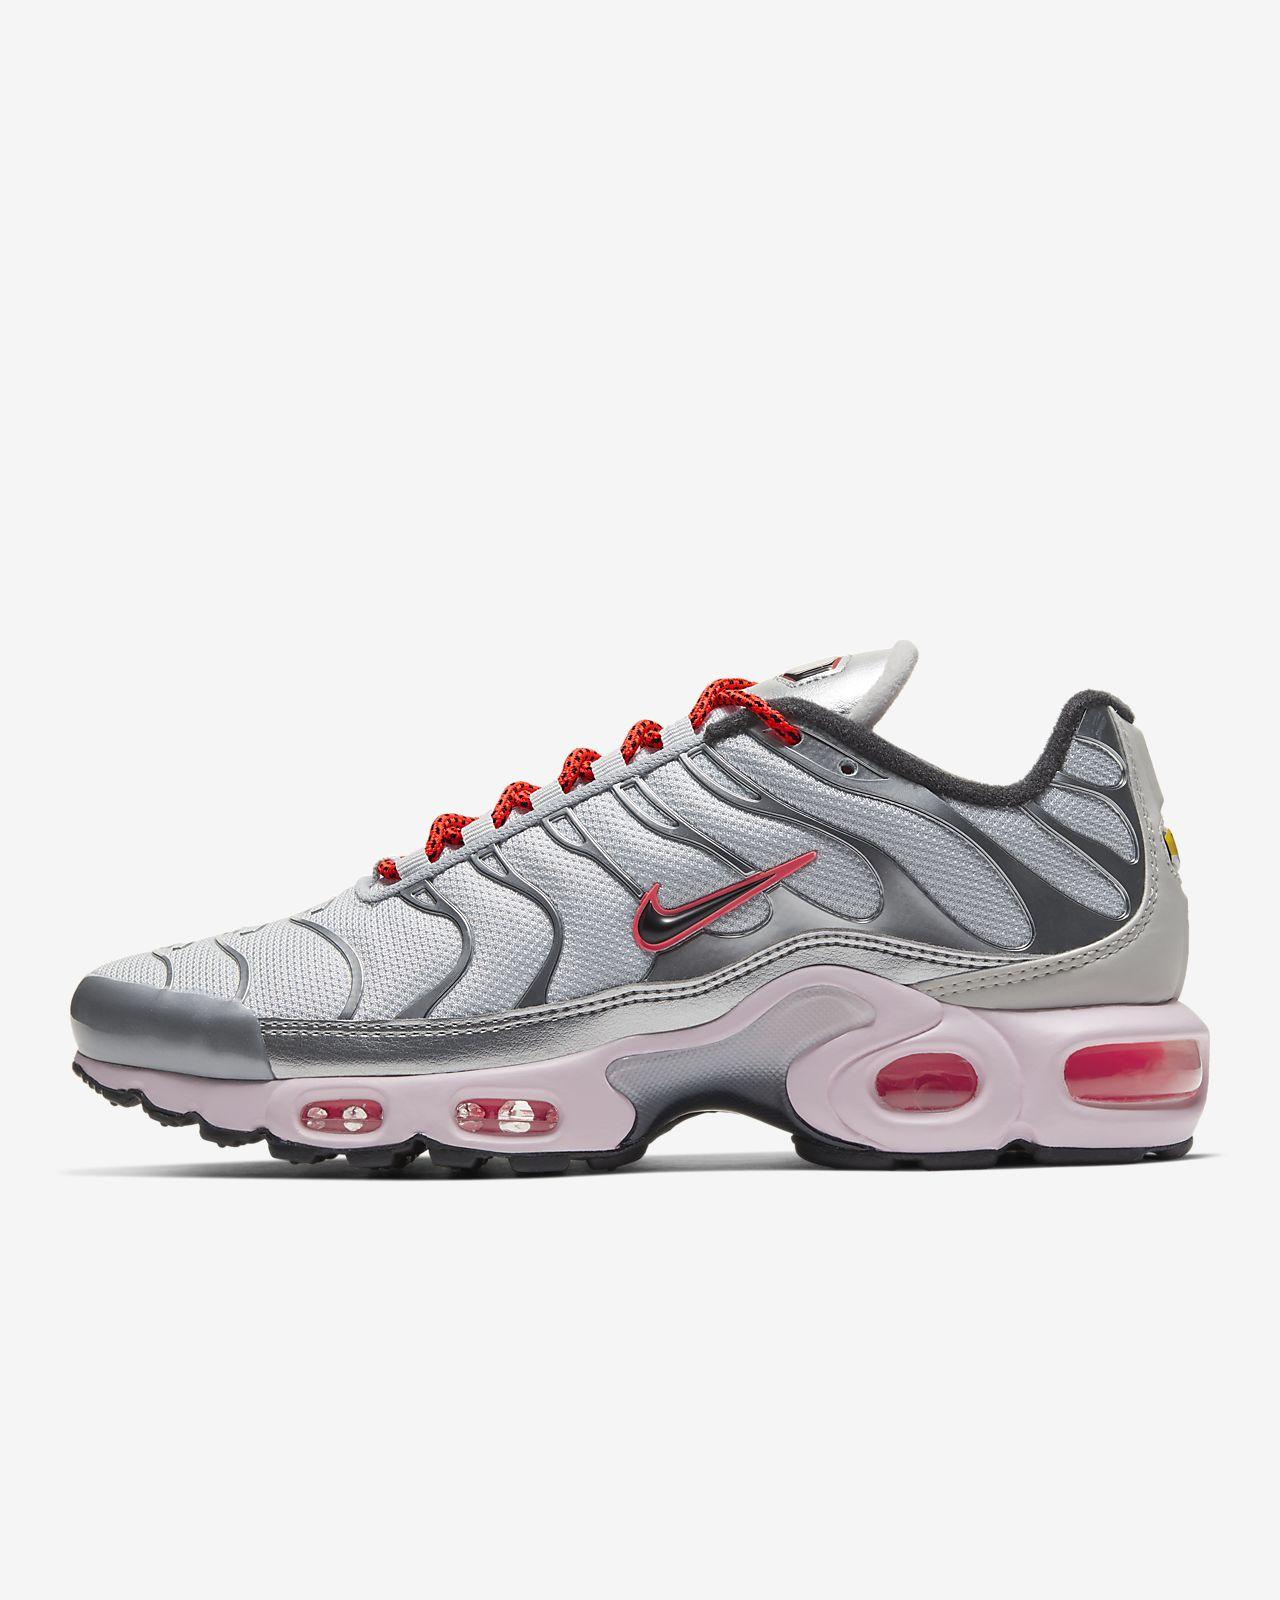 Good feeling Buy Cheap Women Nike Air Max Plus Sneakers